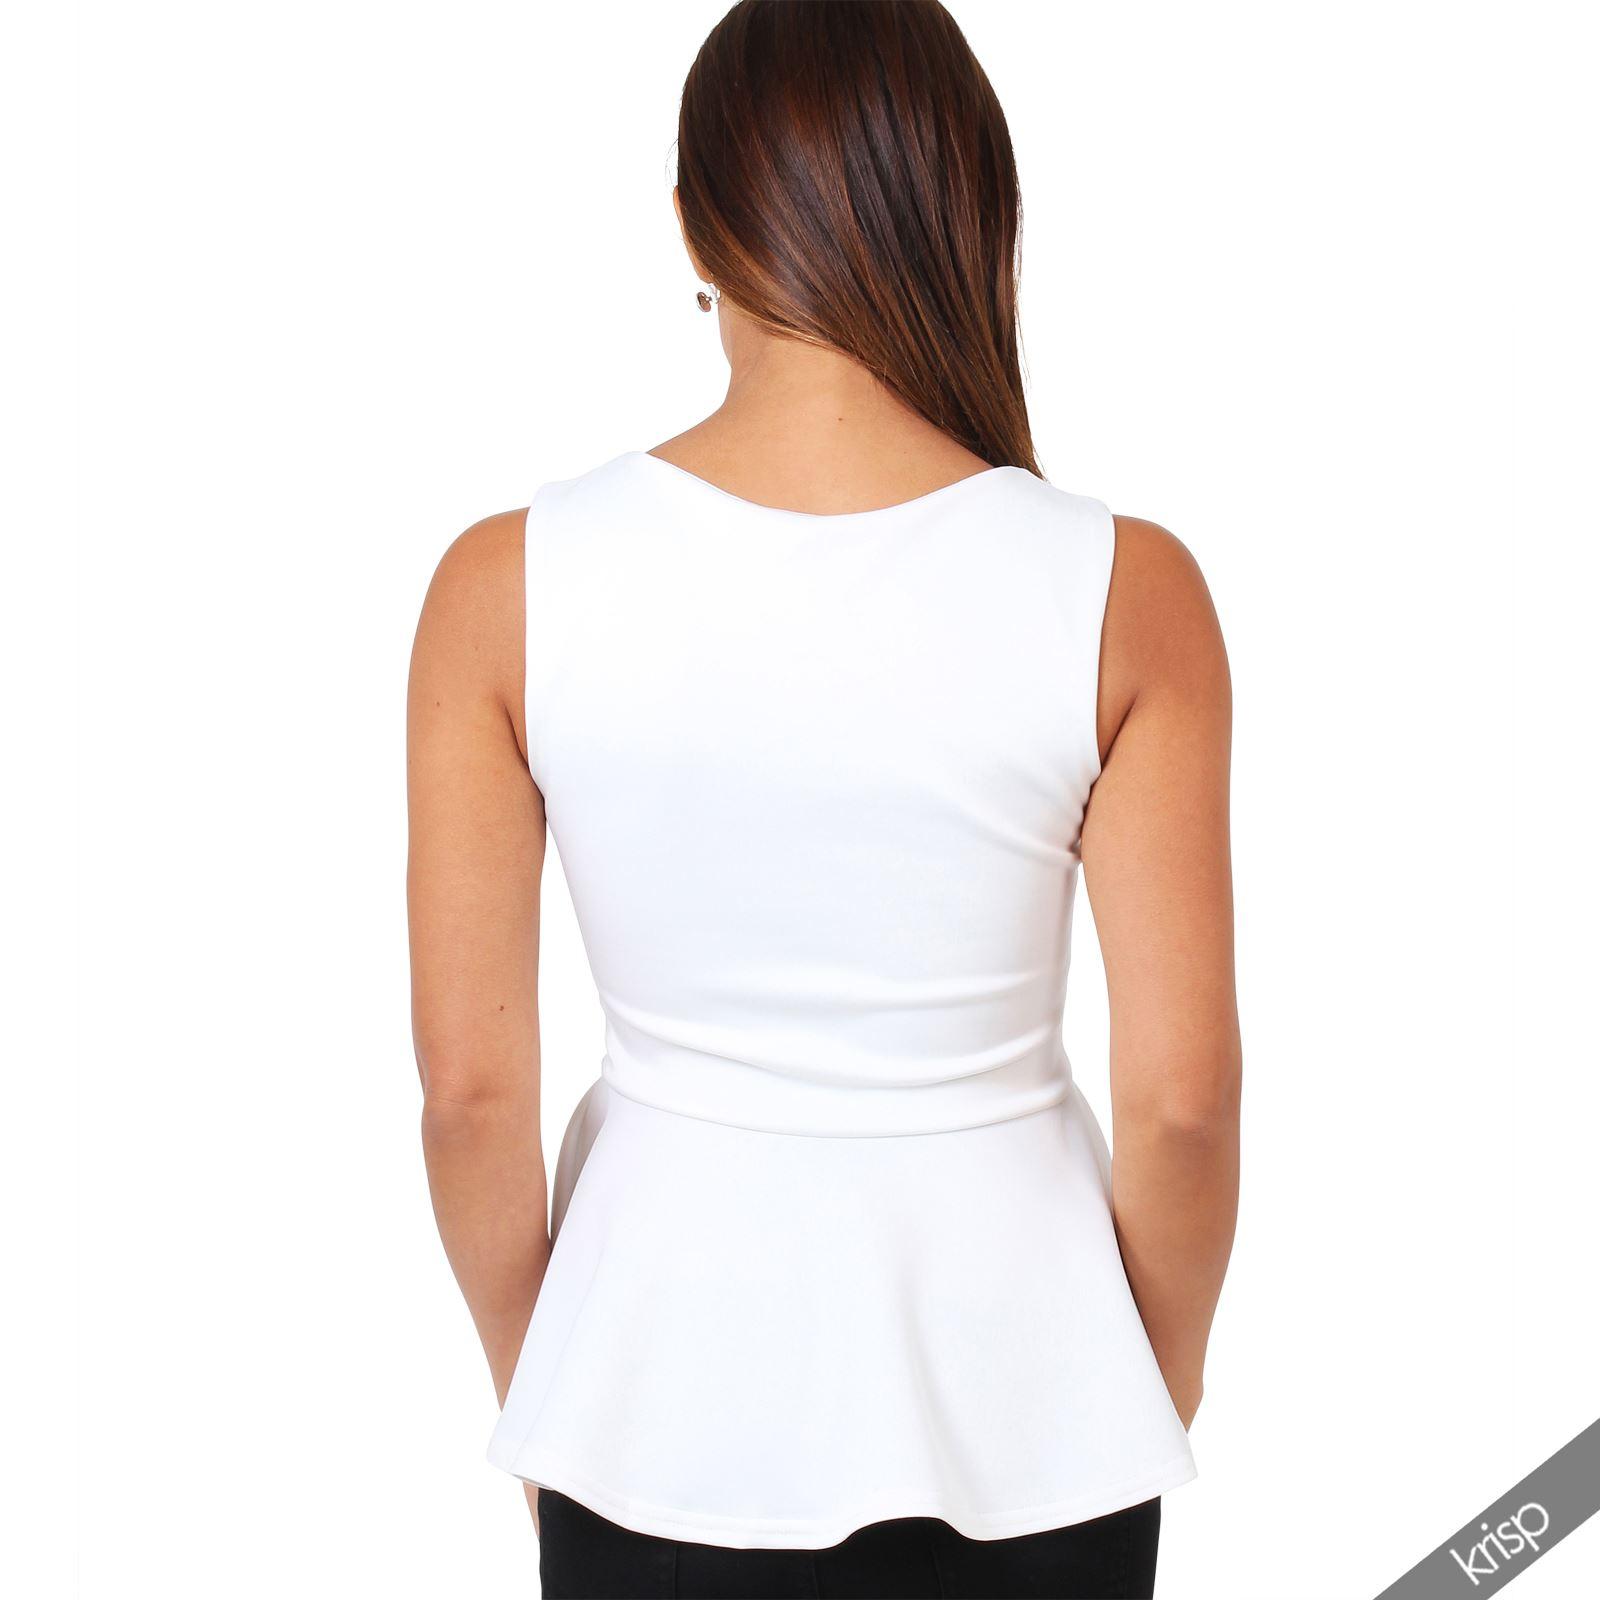 femme haut top blouse peplum col v lacet taille volant e evas e sexy soir e ebay. Black Bedroom Furniture Sets. Home Design Ideas